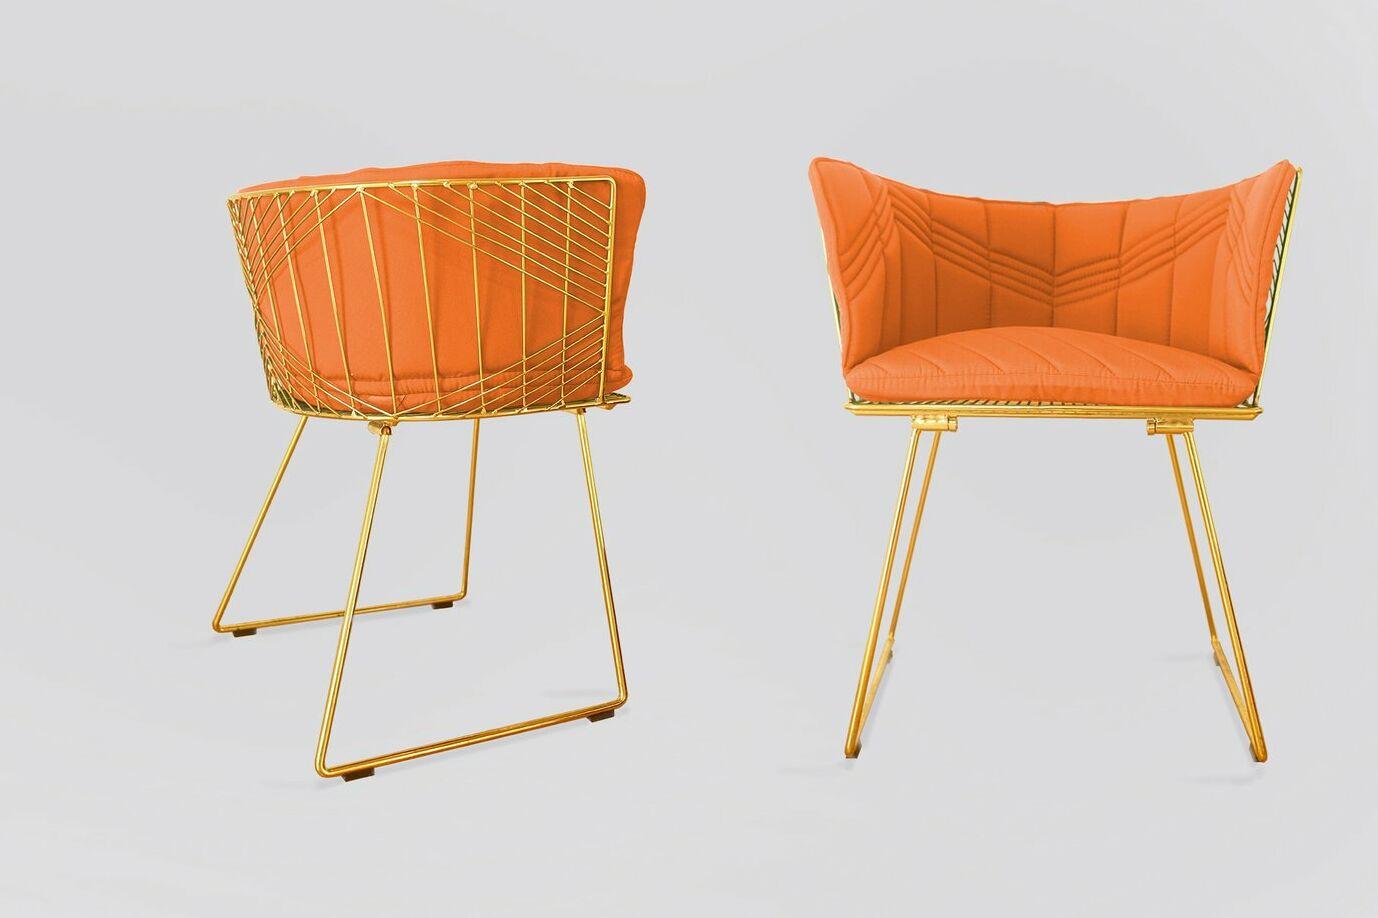 Captain Indoor/Outdoor Sunbrella Dining Chair Cushion Fabric: Melon